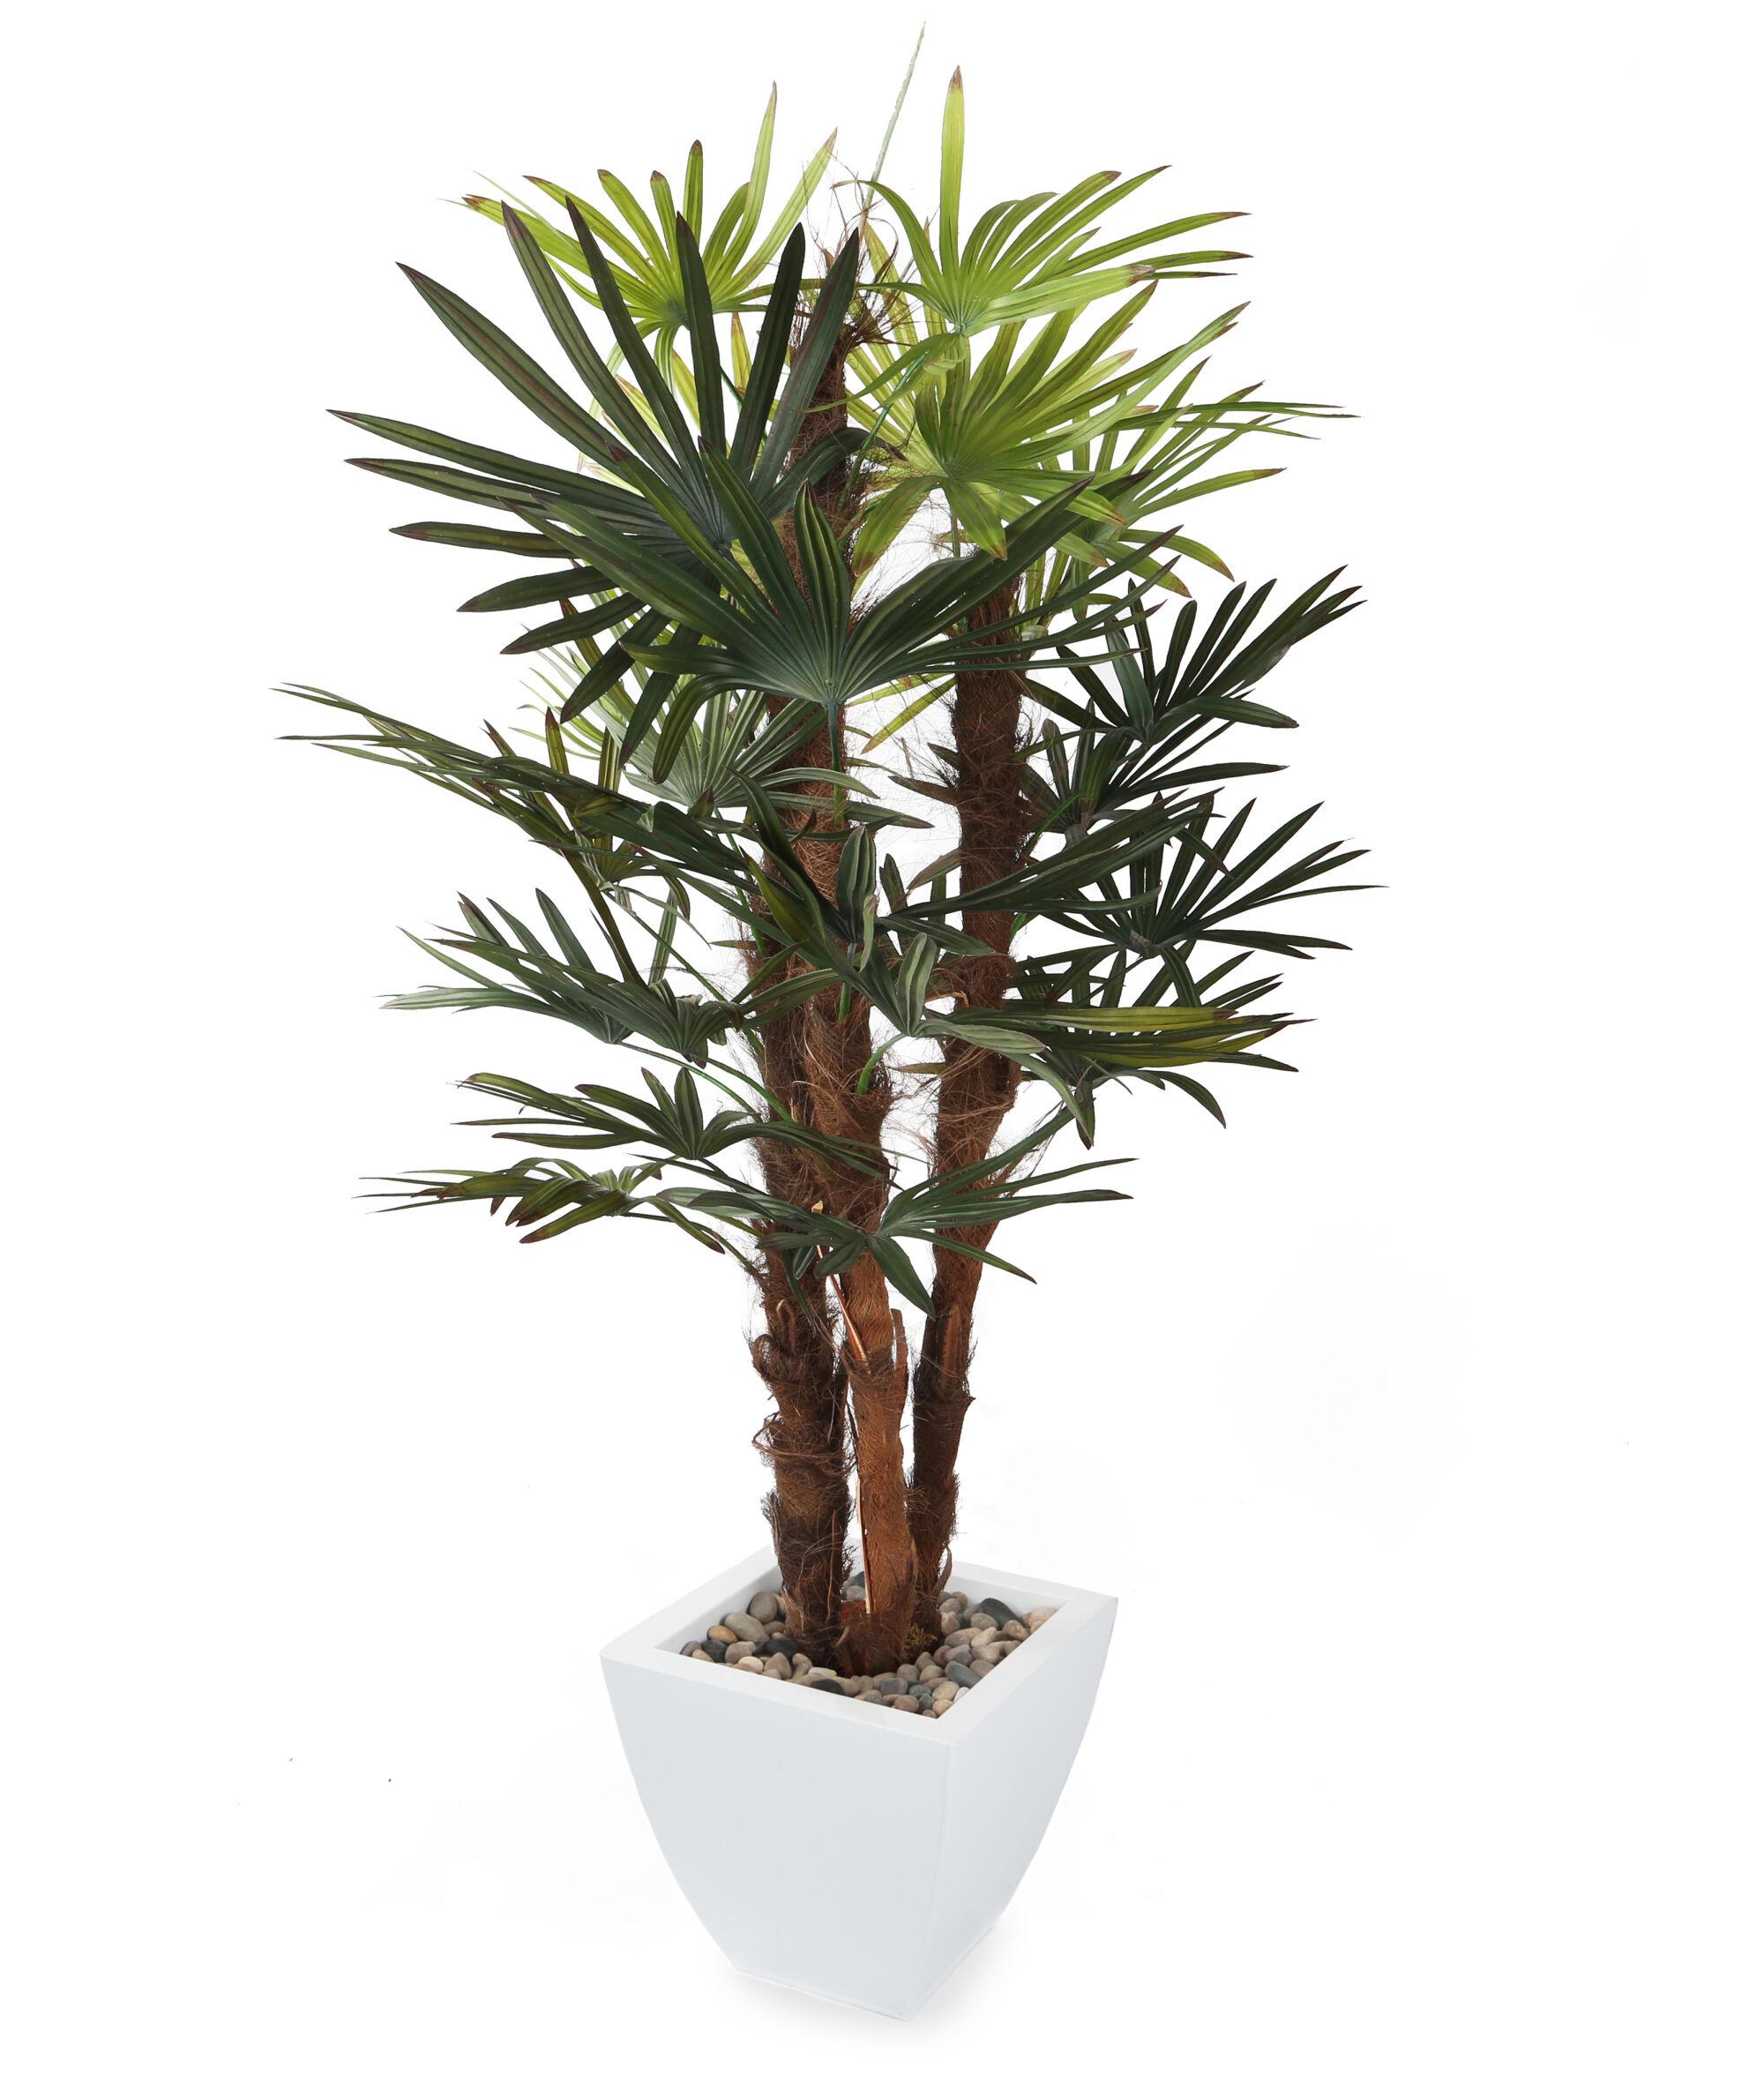 Artificial 4ft 5 lady palm tree fake palm tree faux palm for Acheter palmier artificiel